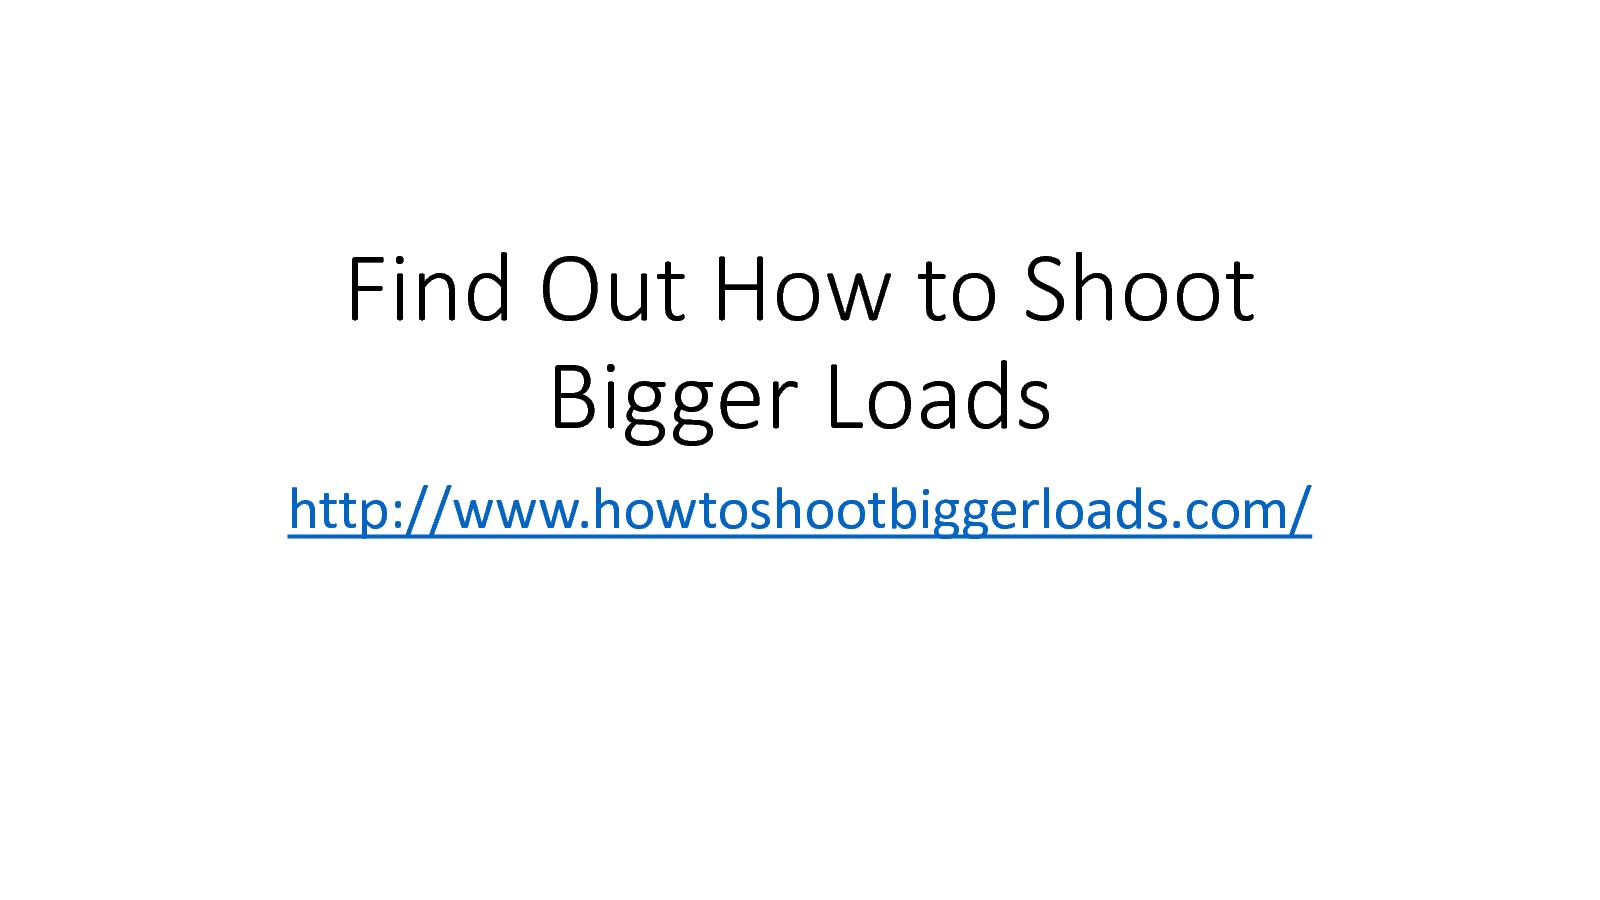 Bigger loads for Rifle Bullets